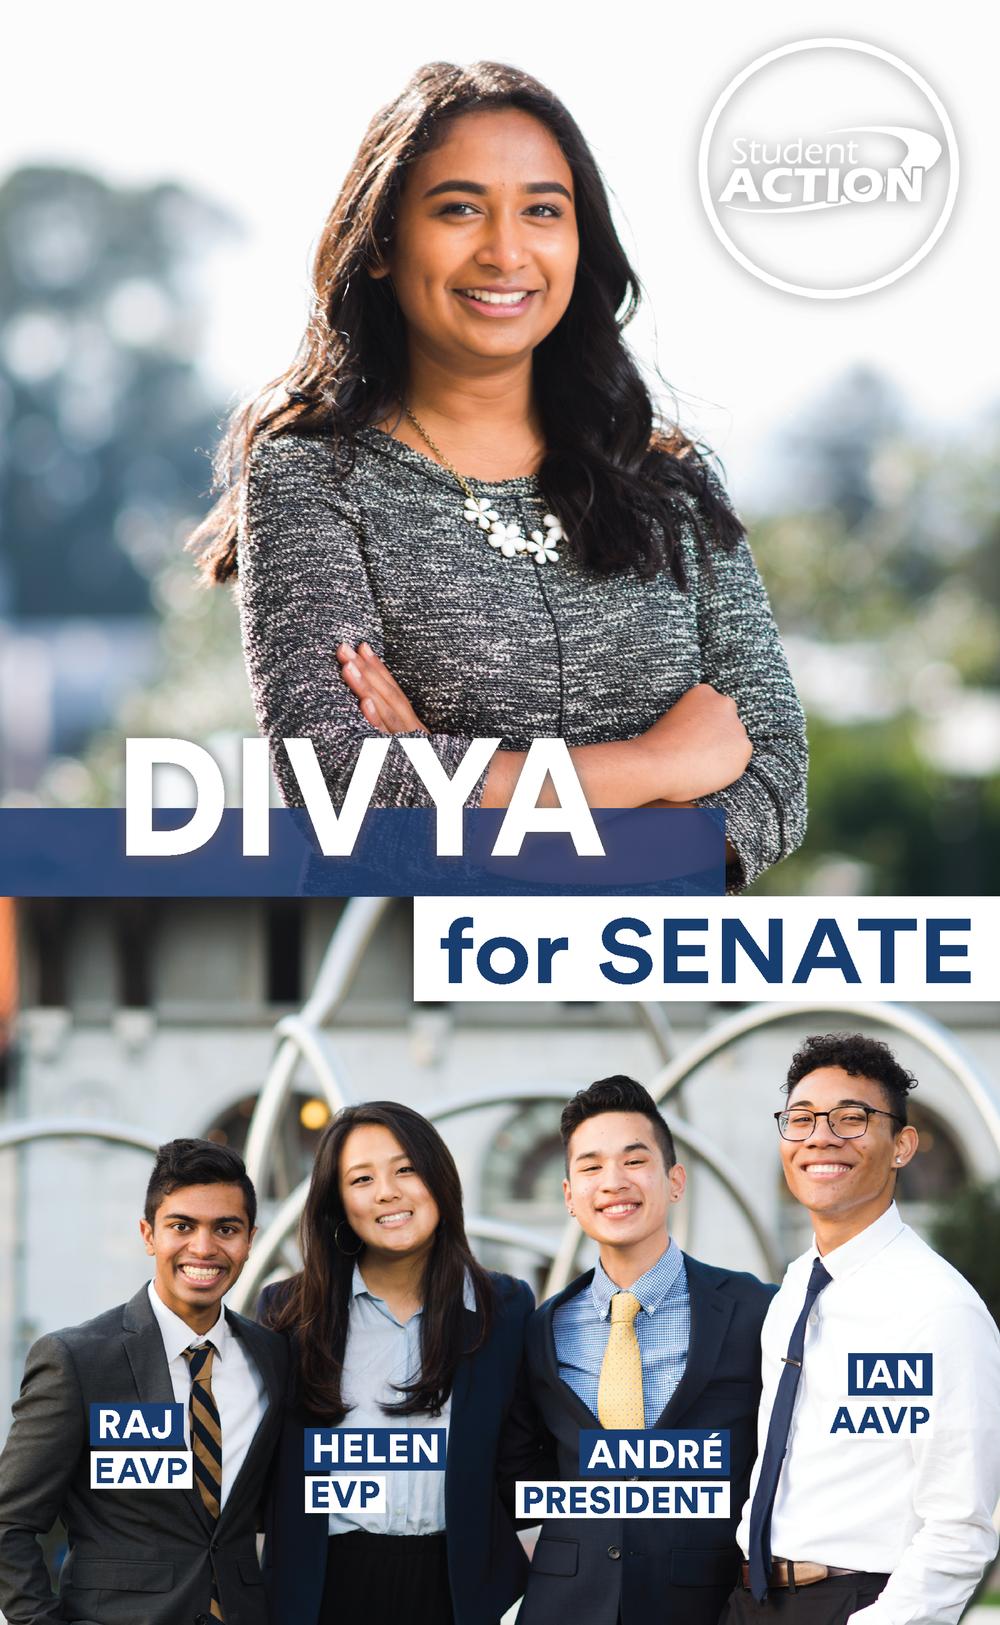 Divya Vijay